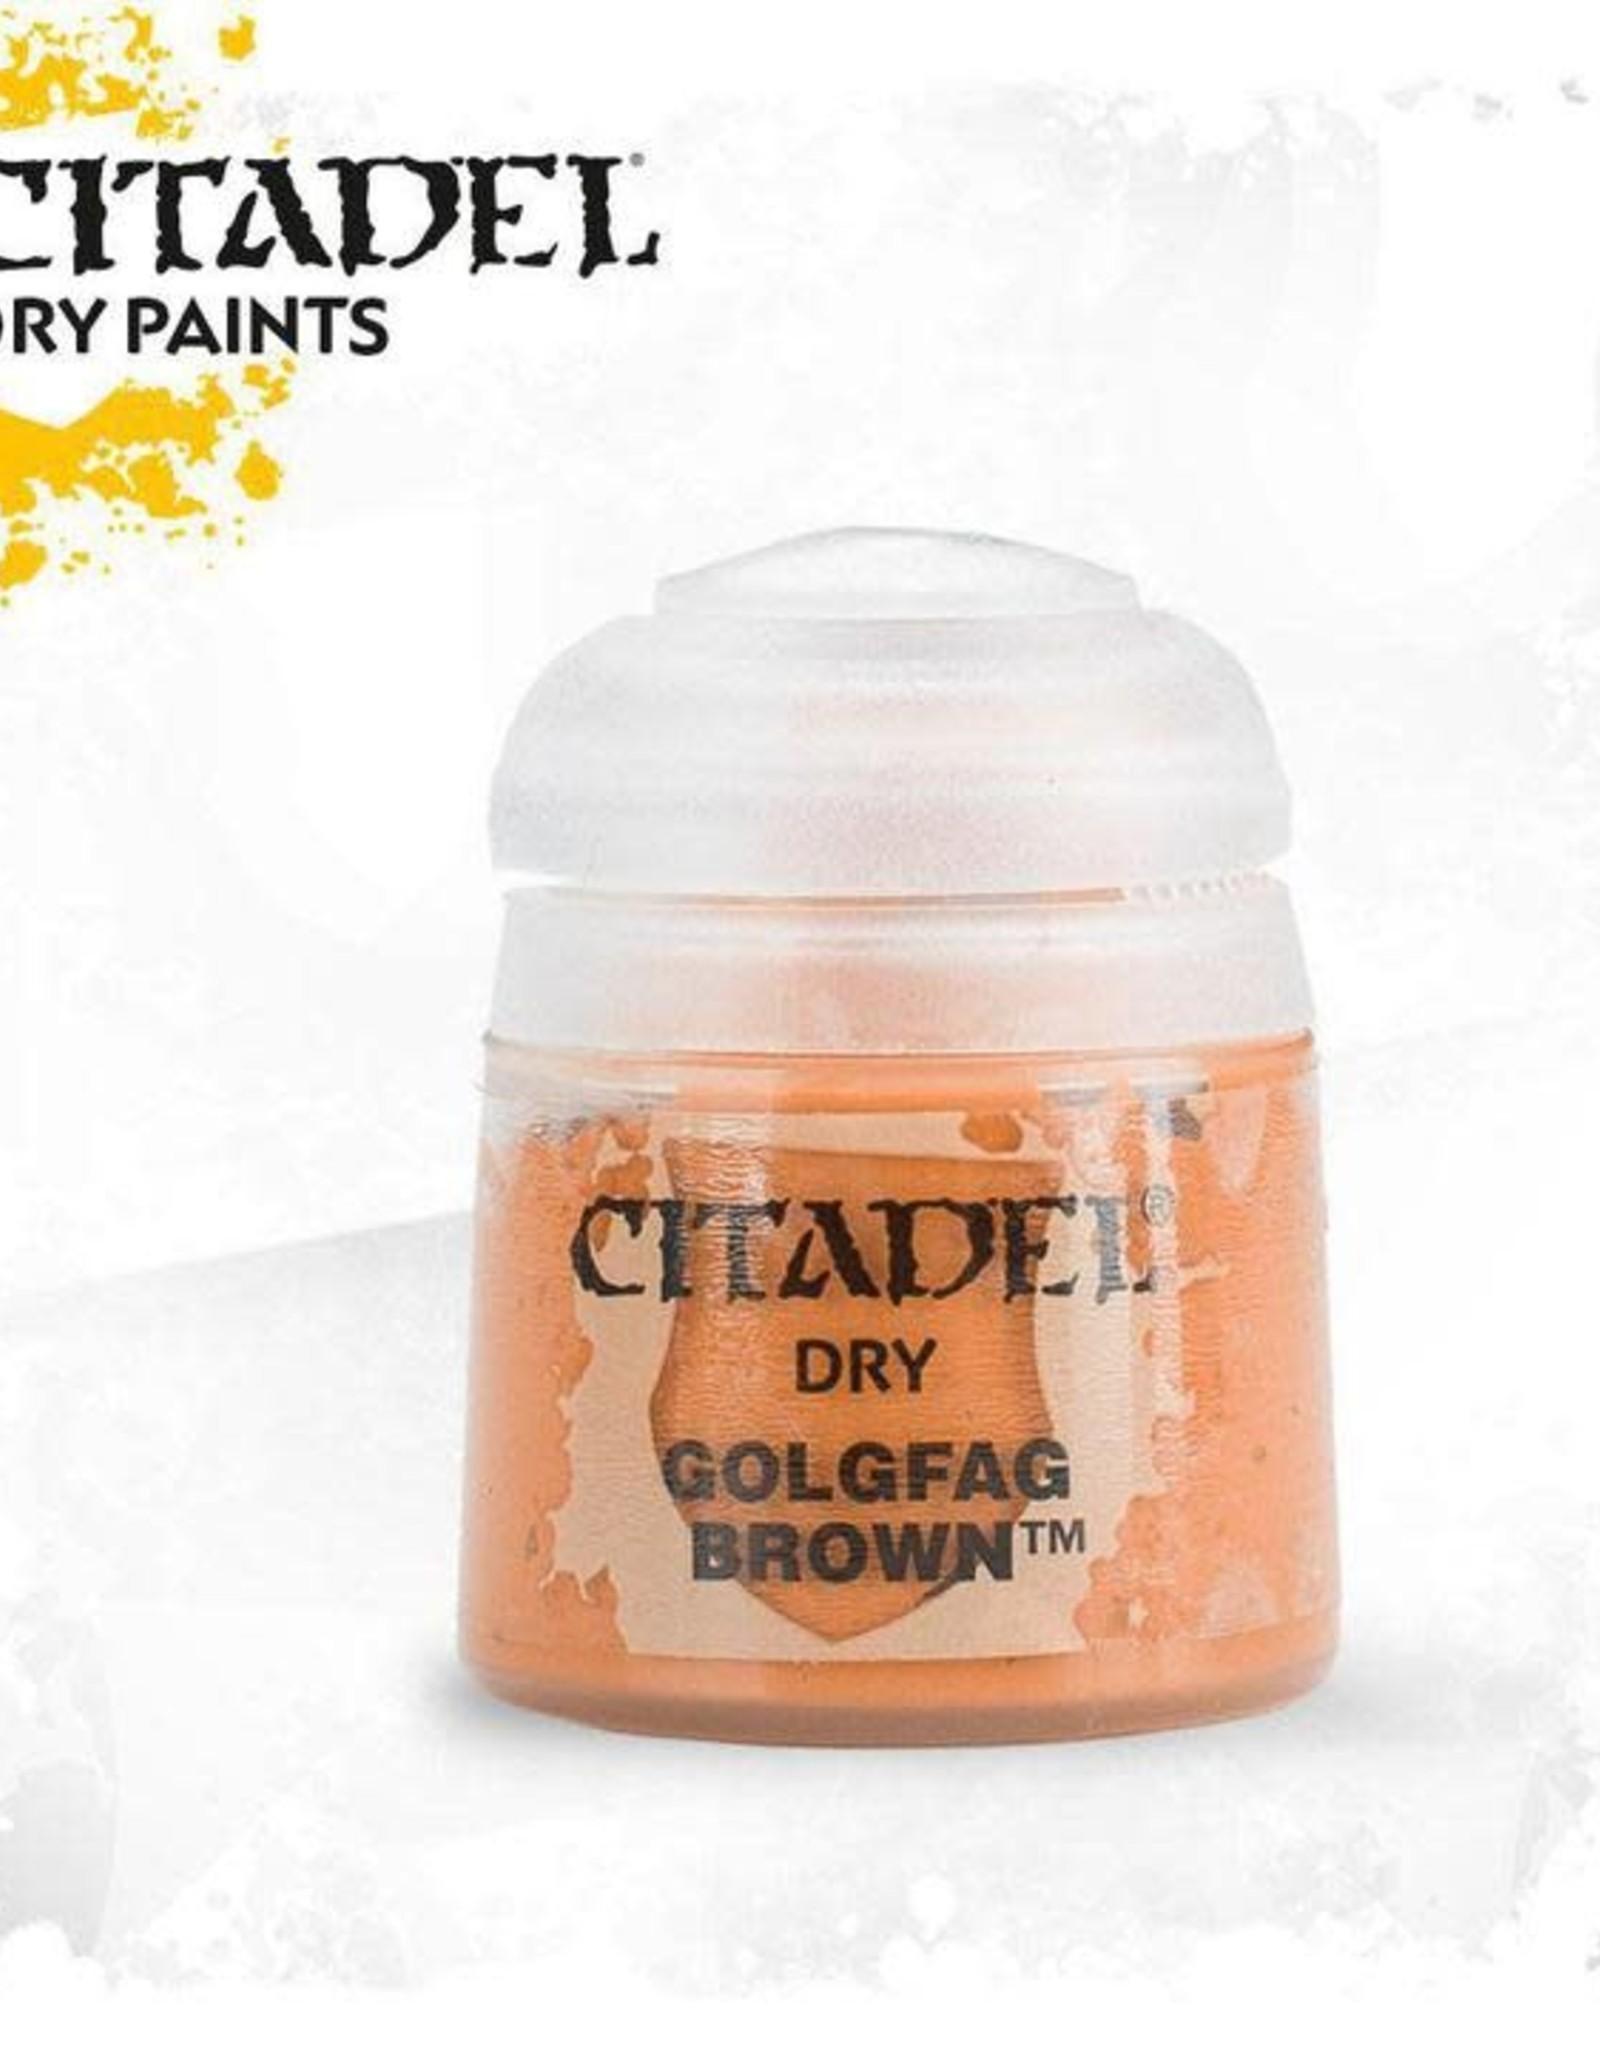 Games Workshop Citadel Paint: Dry - Golgfag Brown